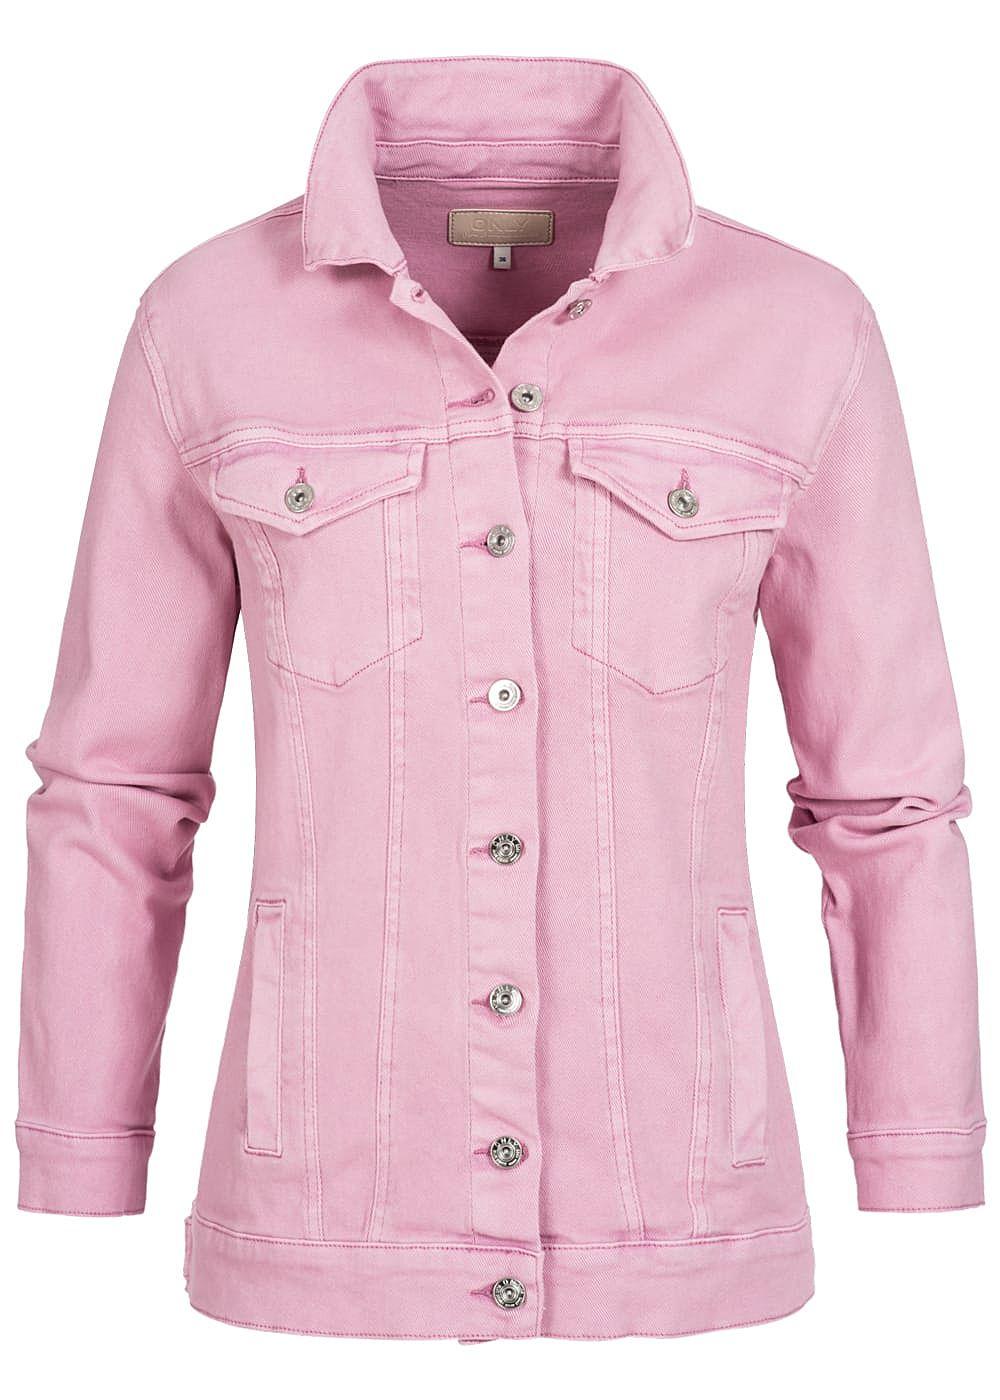 Only damen oversize jeansjacke 2 brusttaschen 2 deko taschen begonia pink 77onlineshop - Jeansjacke damen oversize ...